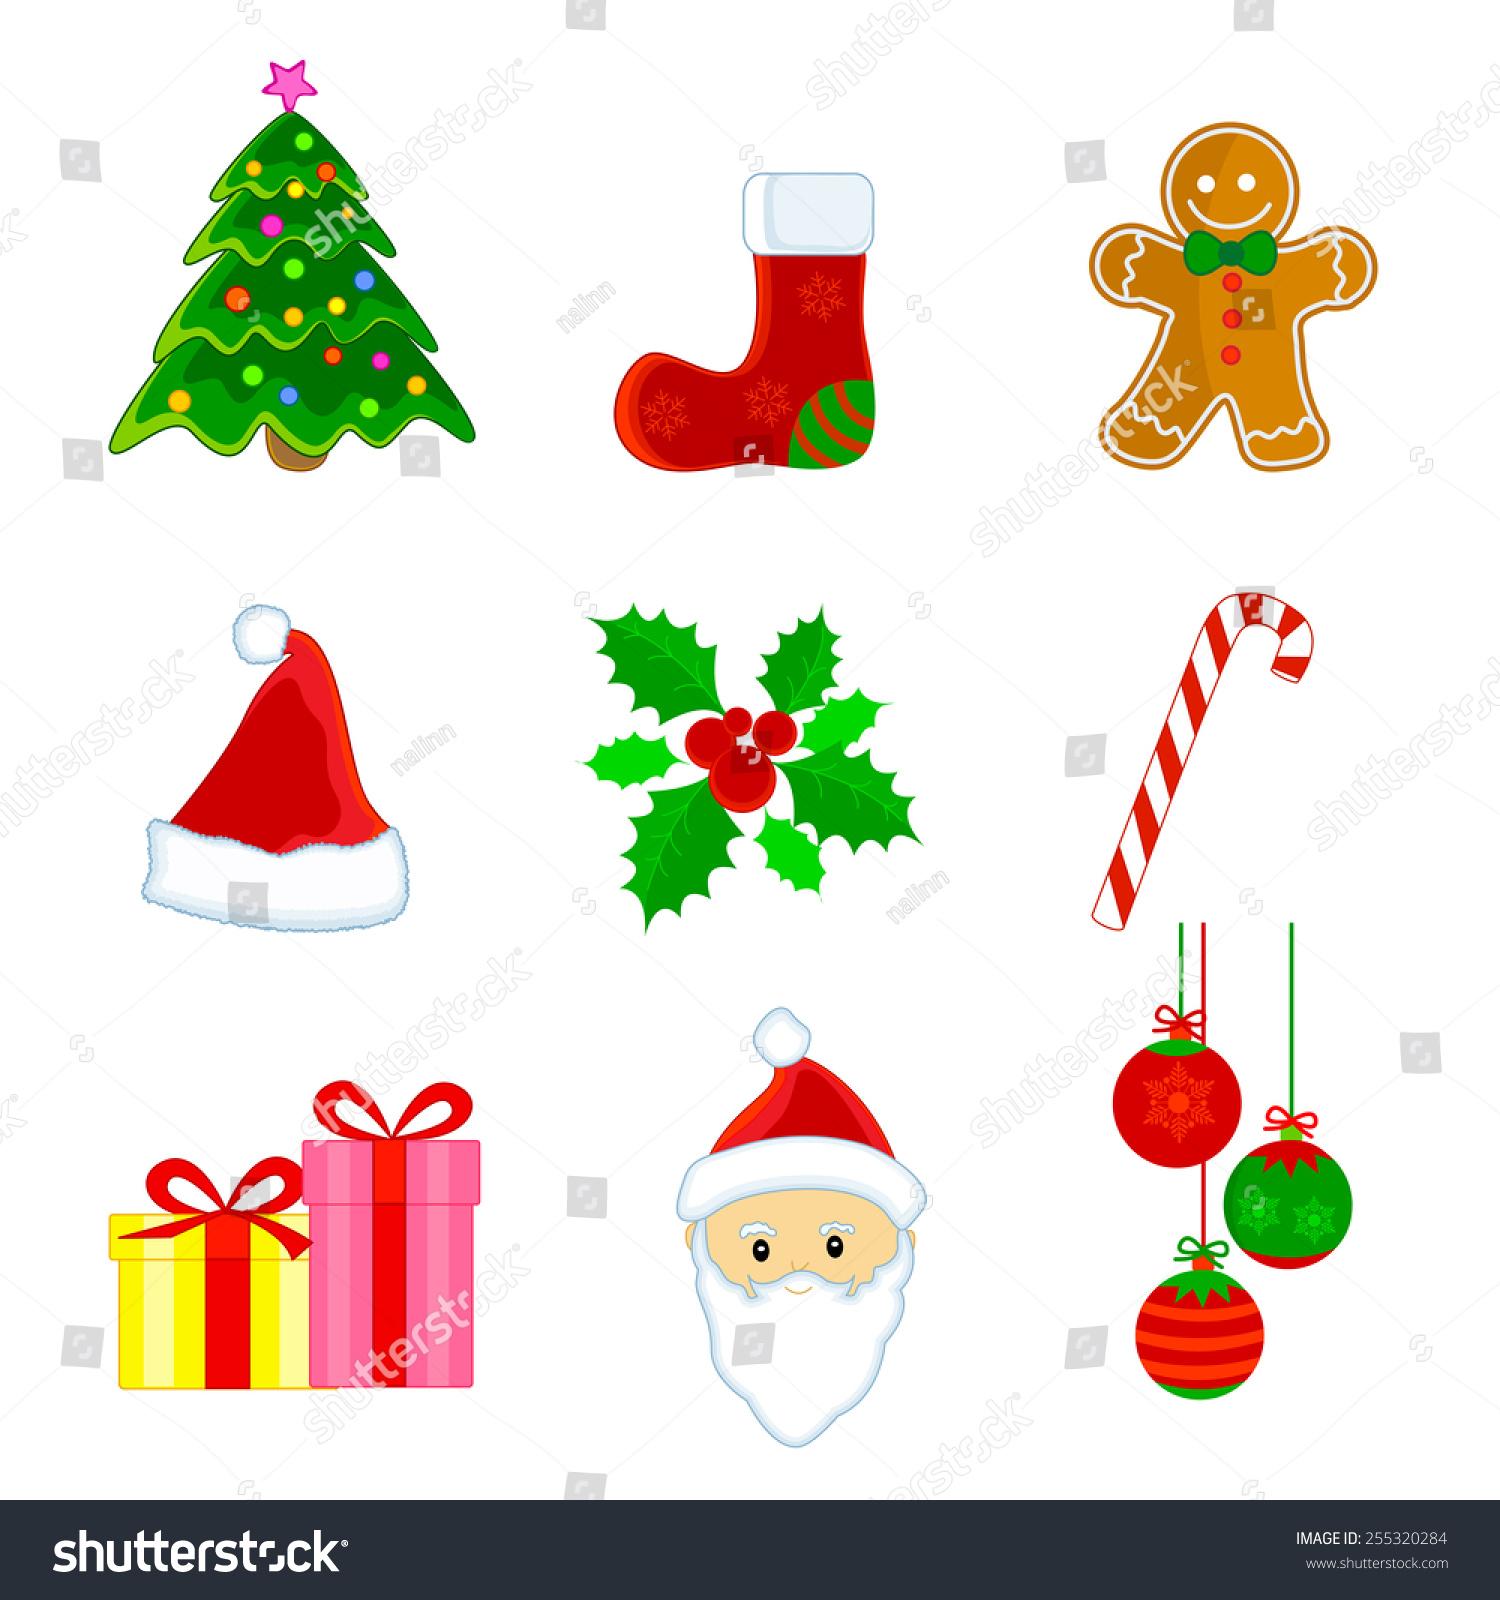 Cute Christmas Web Icon Clipart Set Stock-Vektorgrafik (Lizenzfrei ...